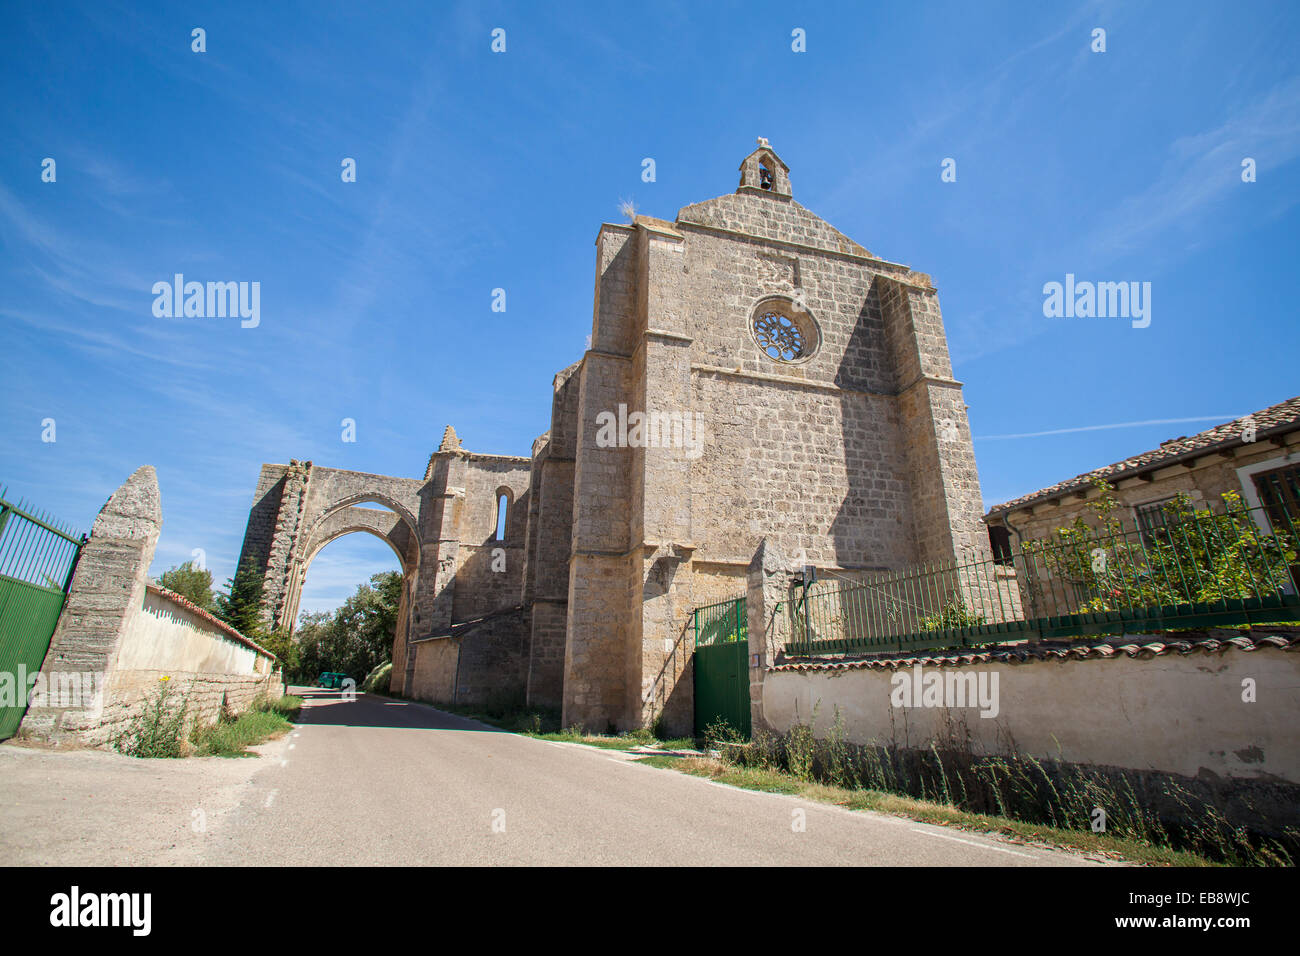 Ruins of the Monastery of San Anton near Castrojeriz village, Way of St. James, Burgos, Spain - Stock Image